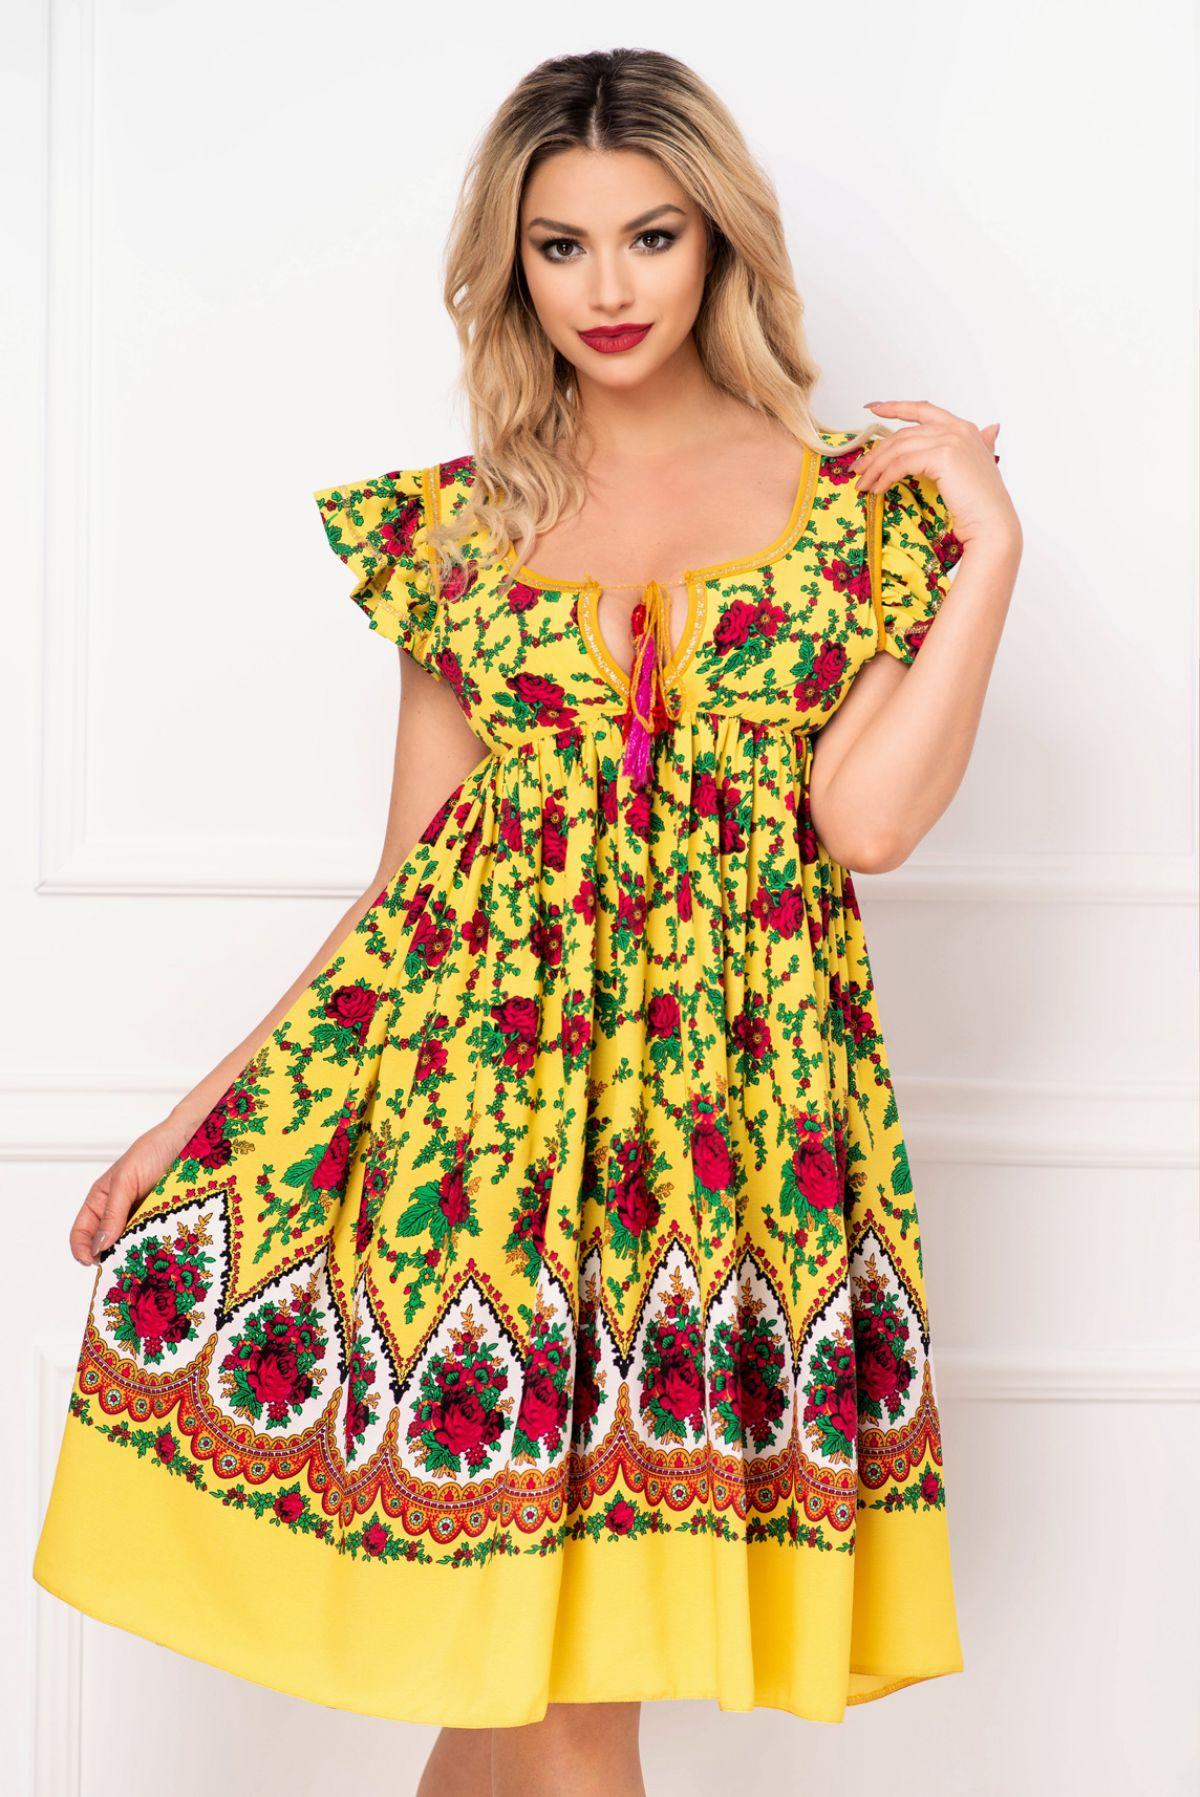 Rochie Venezia lejera galbena cu decupaj la spate si imprimeu floral Venezia-Artigiano-Moda